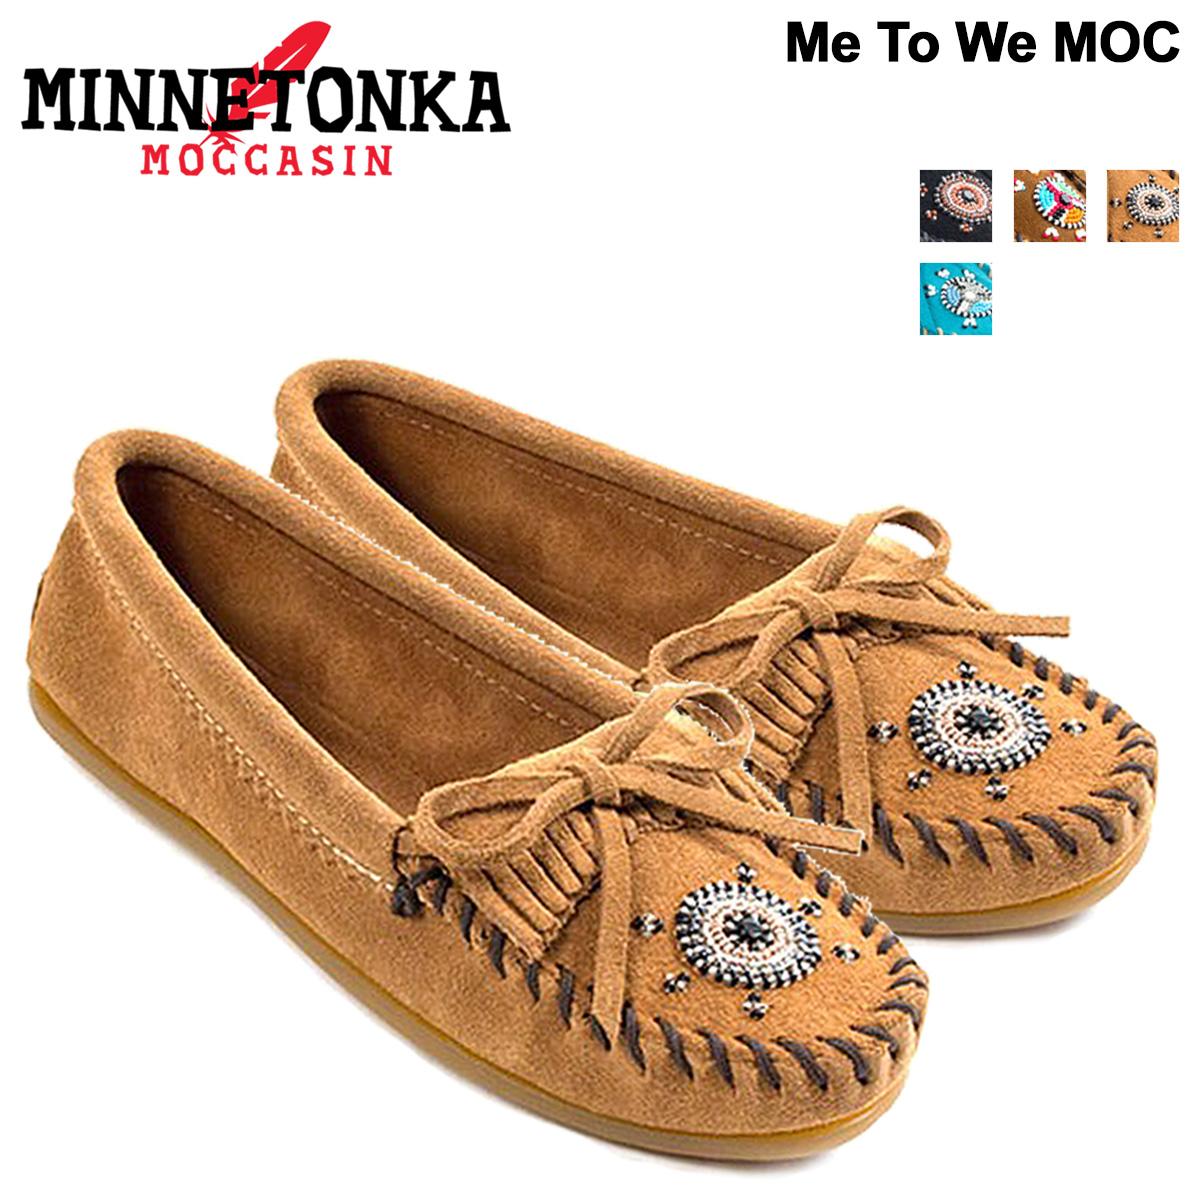 Sugar Online Shop | Rakuten Global Market: Minnetonka moccasins Womens MINNETONKA MOC MOC Me To We collaborated Brown [book product 11 / 29 days in stock new stock plan]